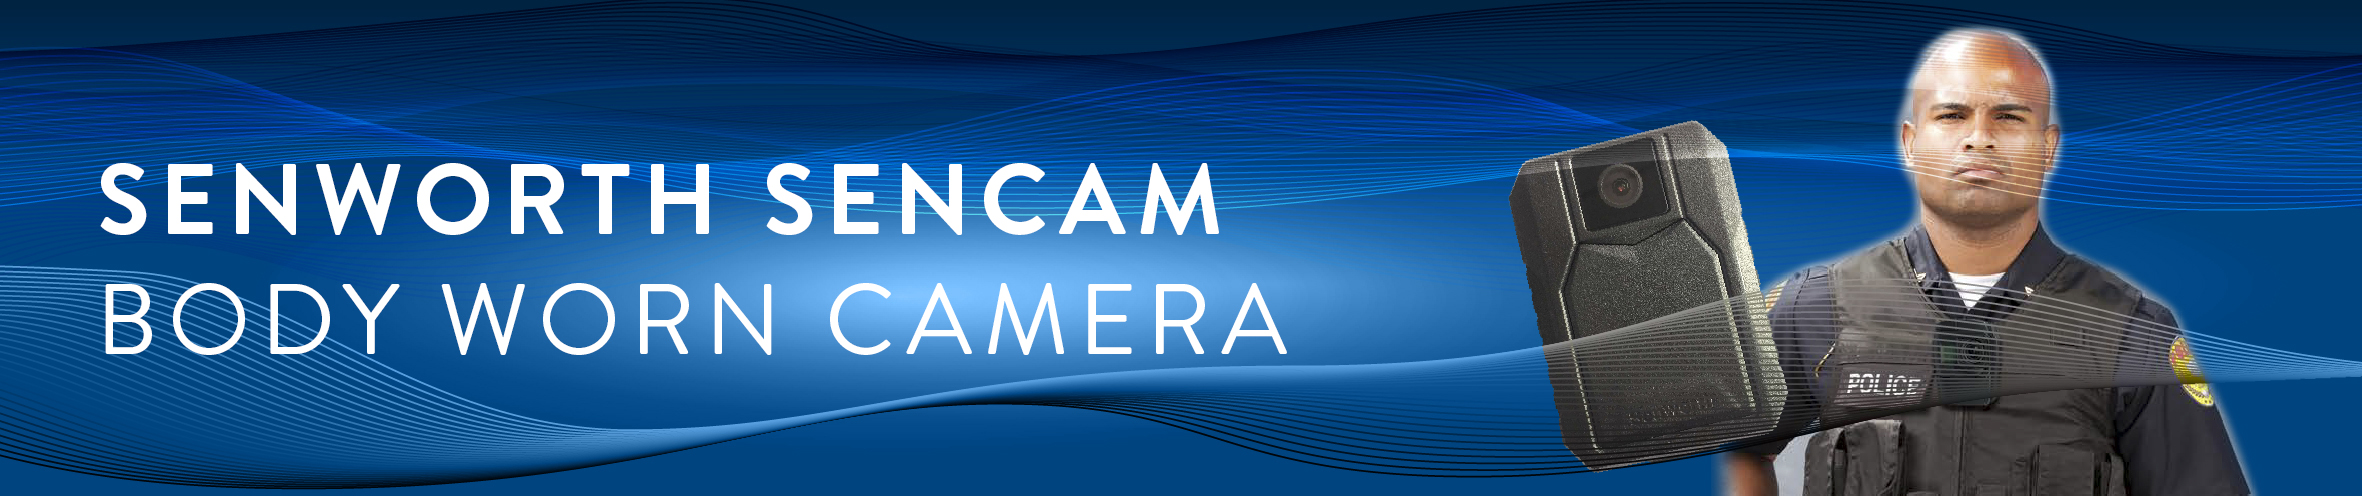 Senworth Sencam Body Worn Camera